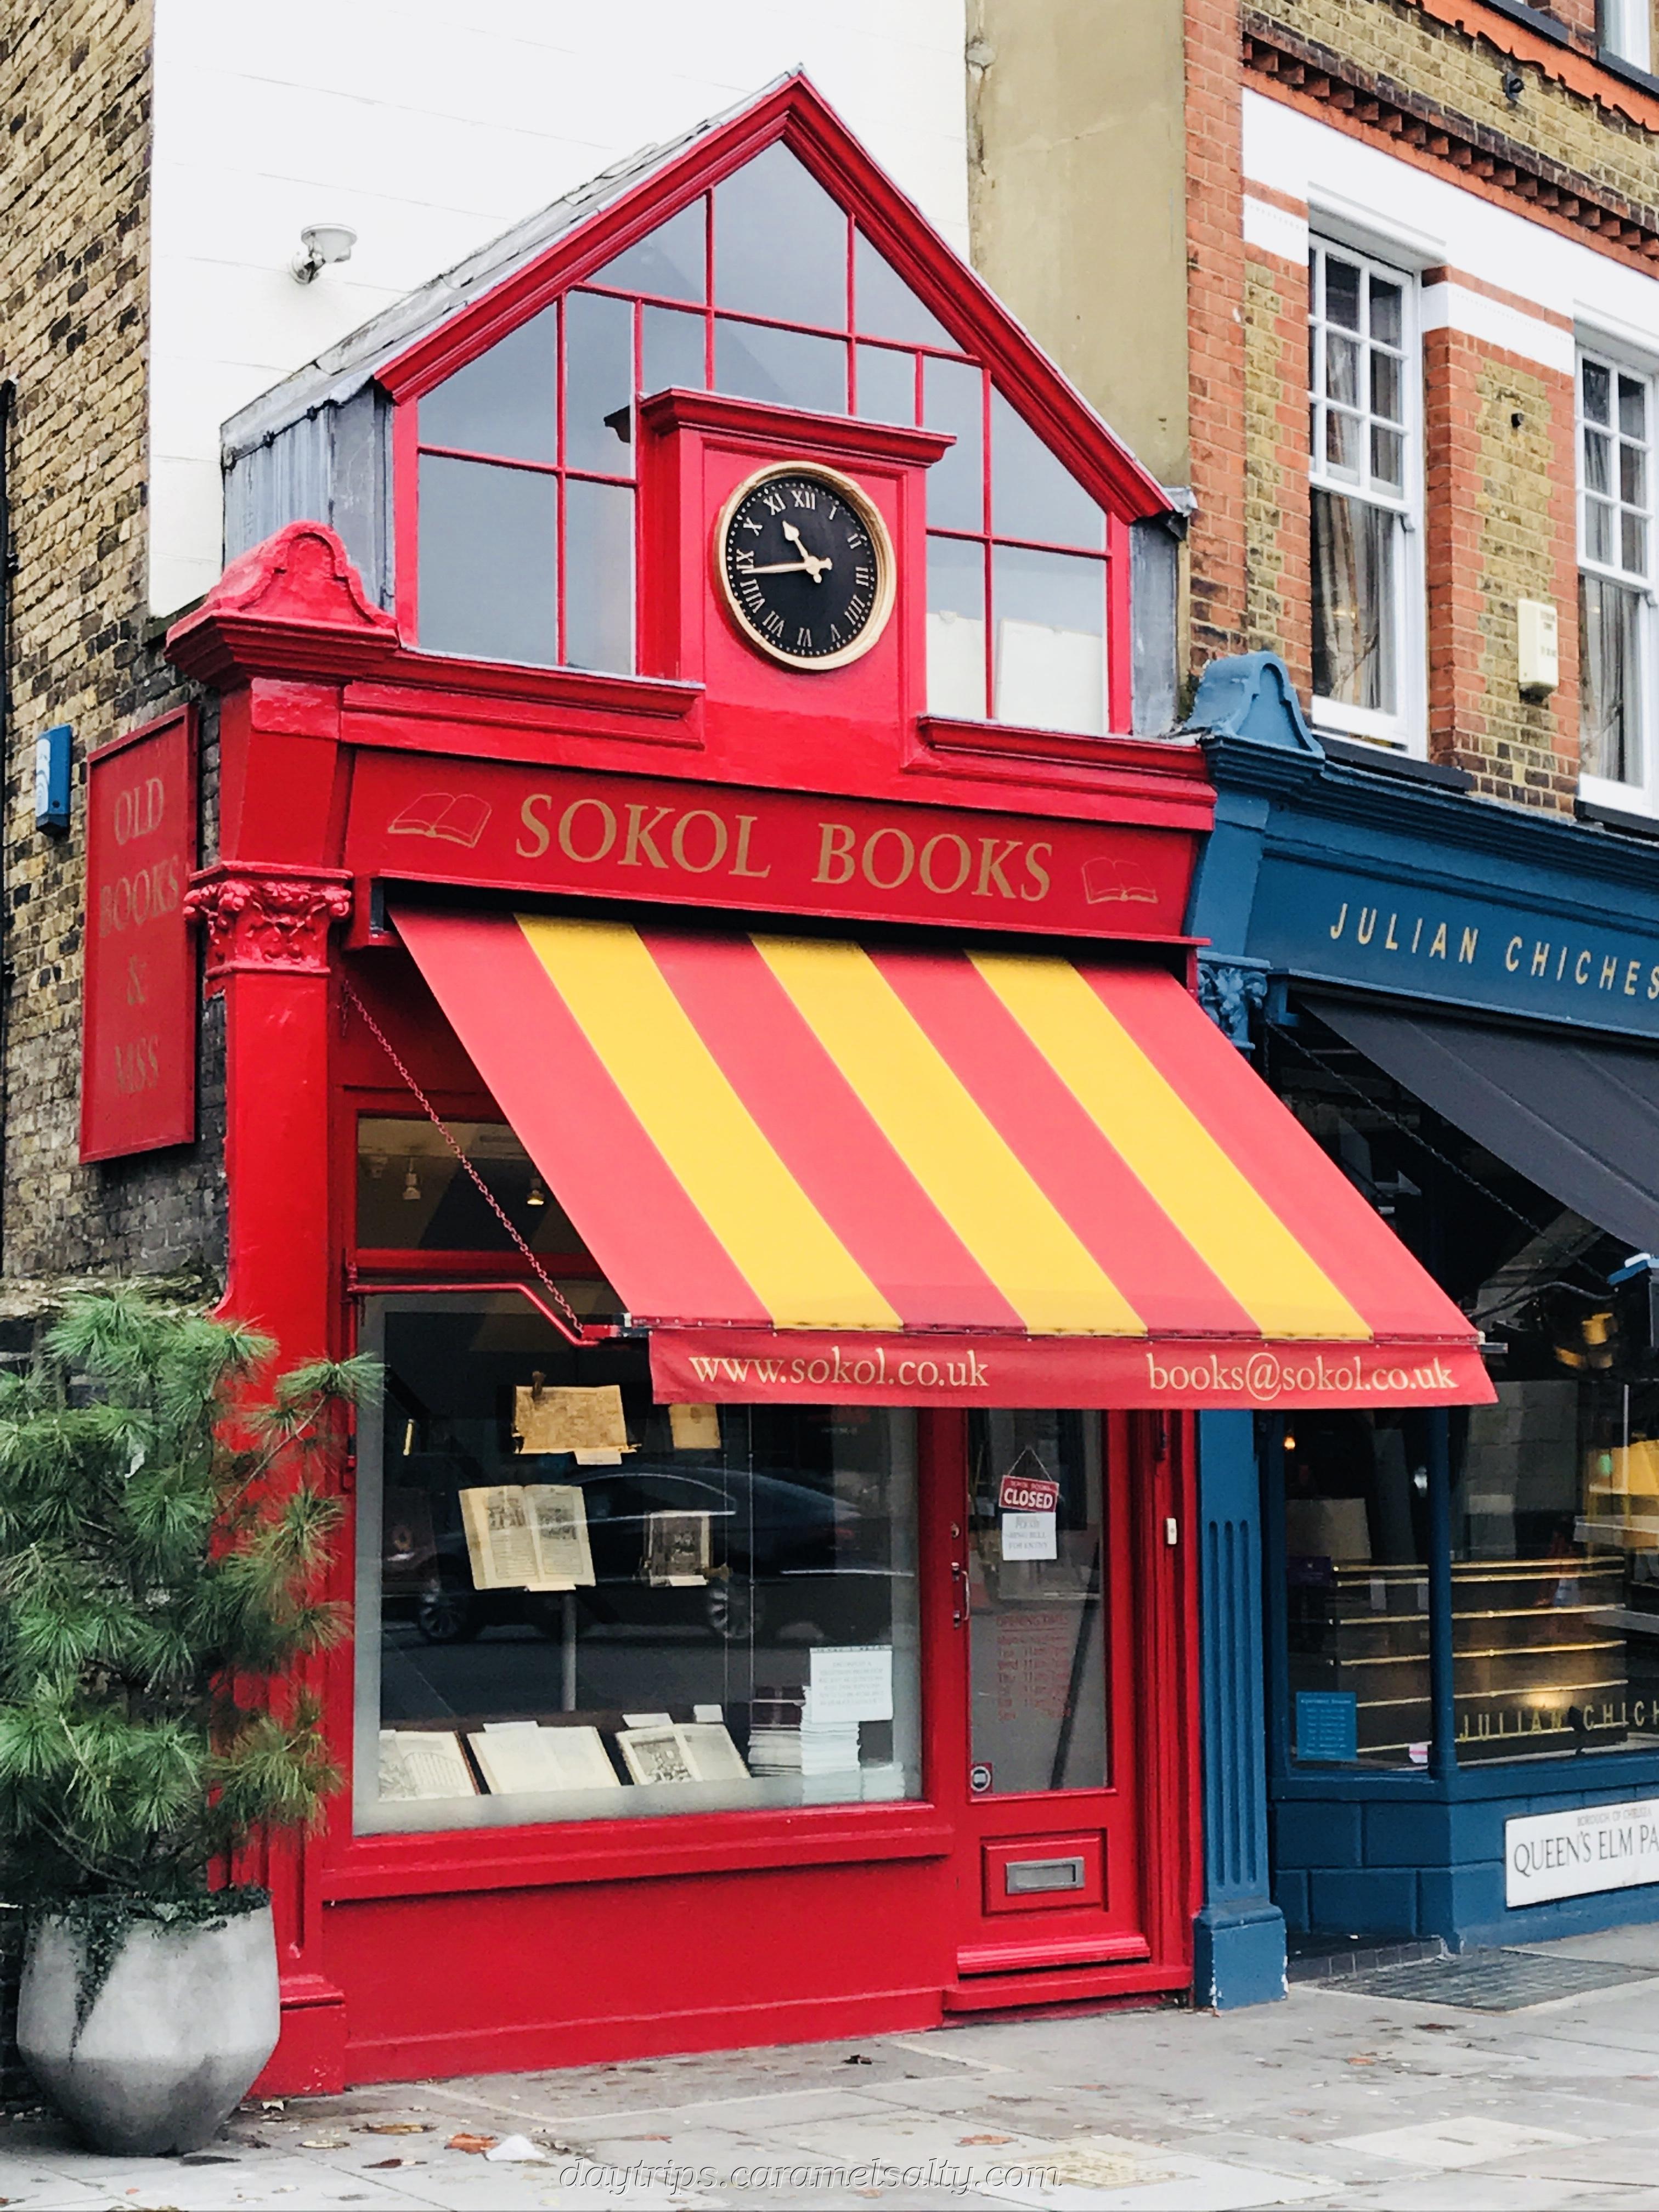 Sokol Books